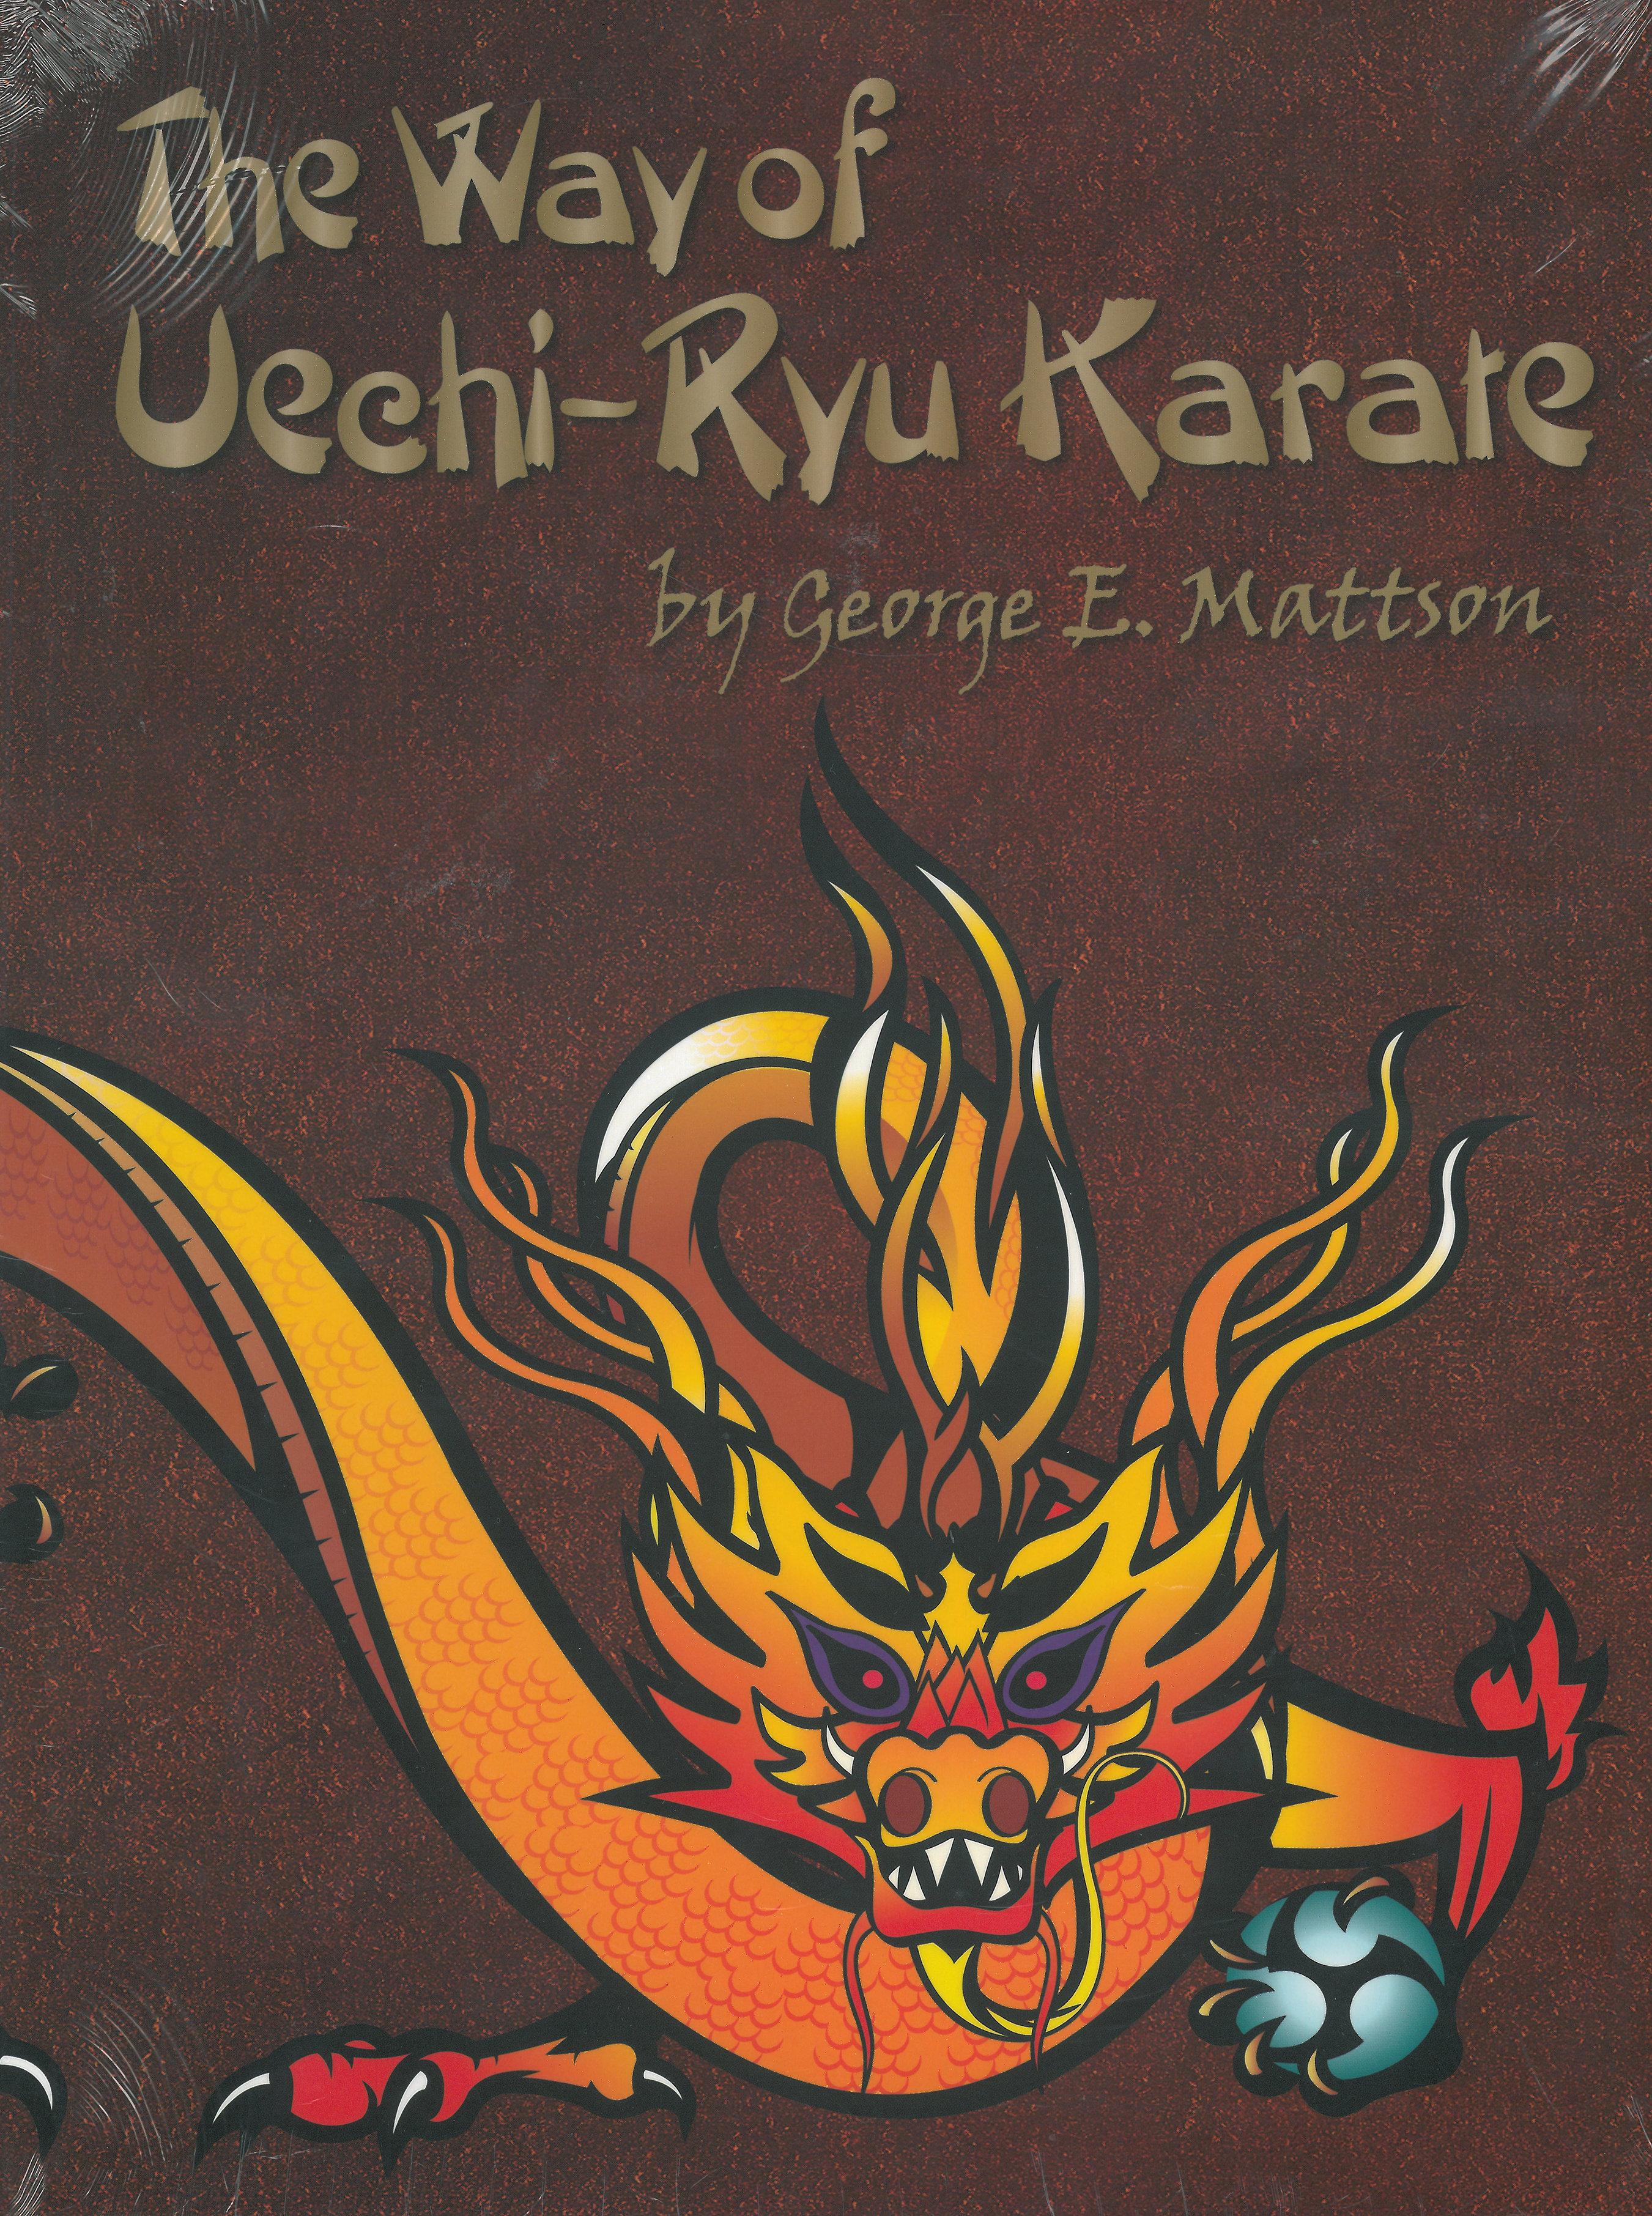 The Way of Uechi-ryu Karate 00033